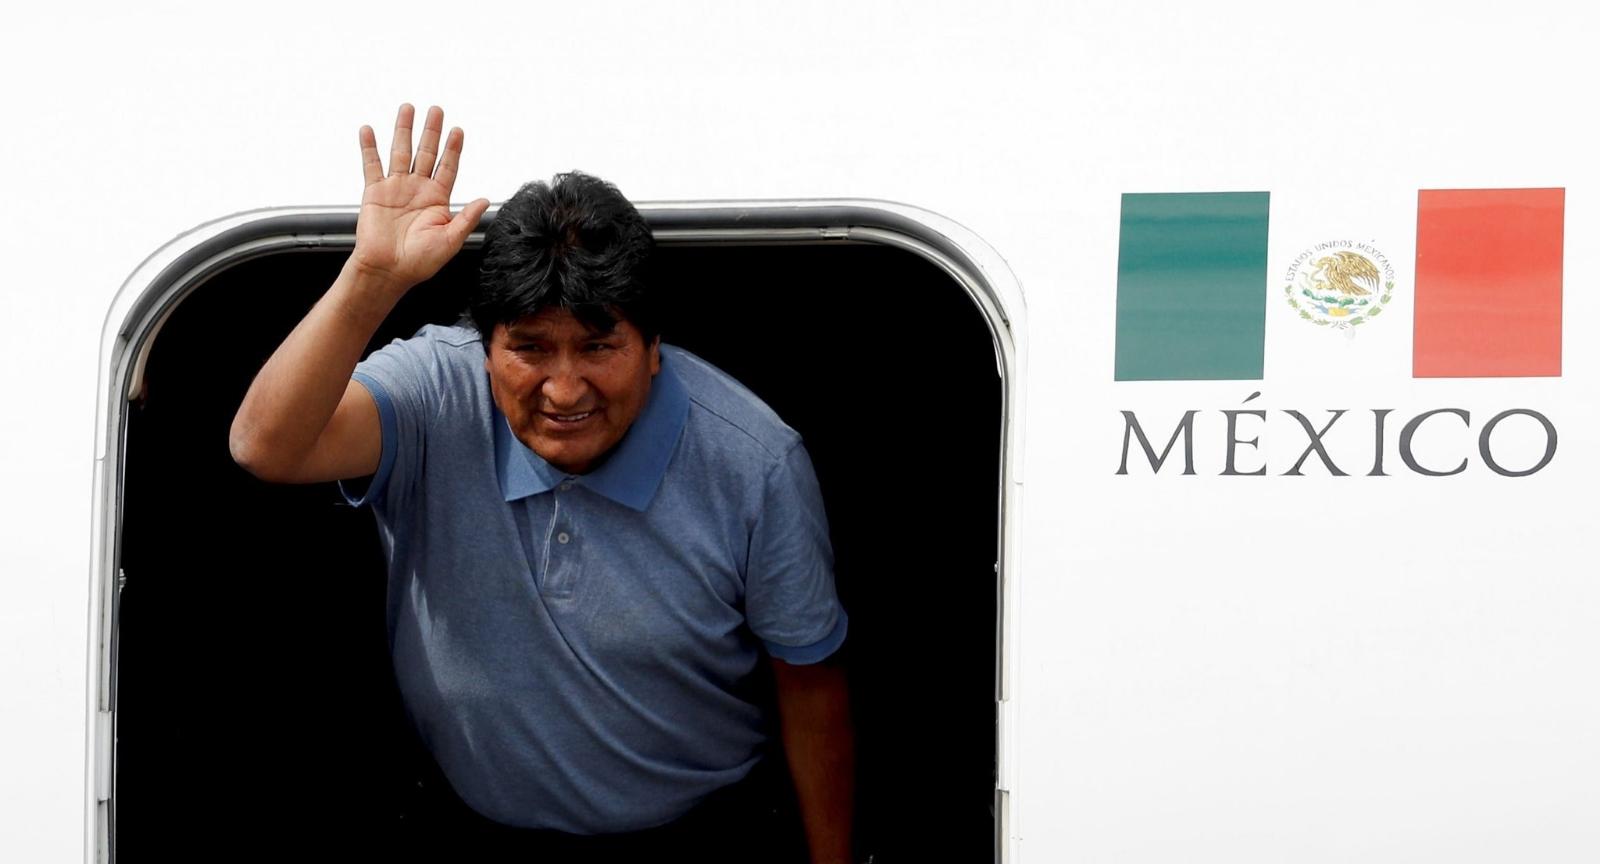 Actualidad: México anunció que concederá asilo político a Evo Morales